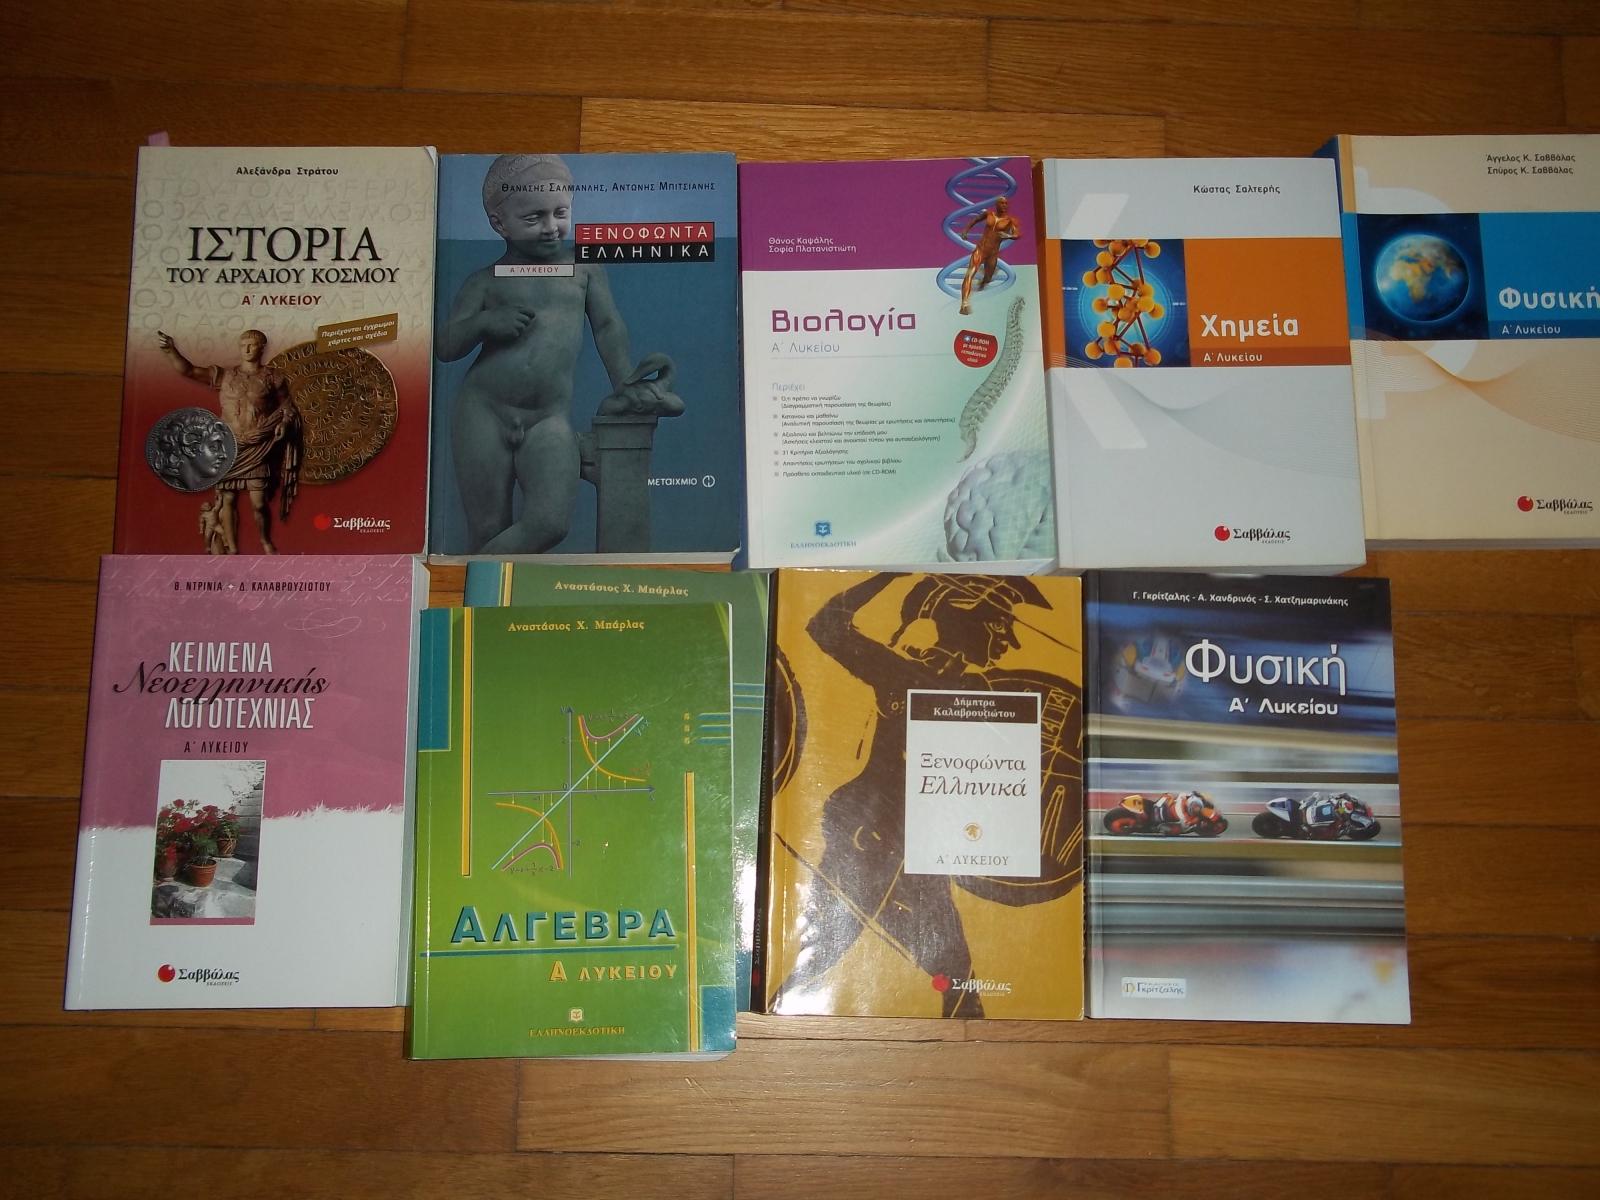 e633c8696b Πωλούνται διάφορα βοηθήματα Γυμνασίου-Λυκείου σε πολύ οικονομική ...